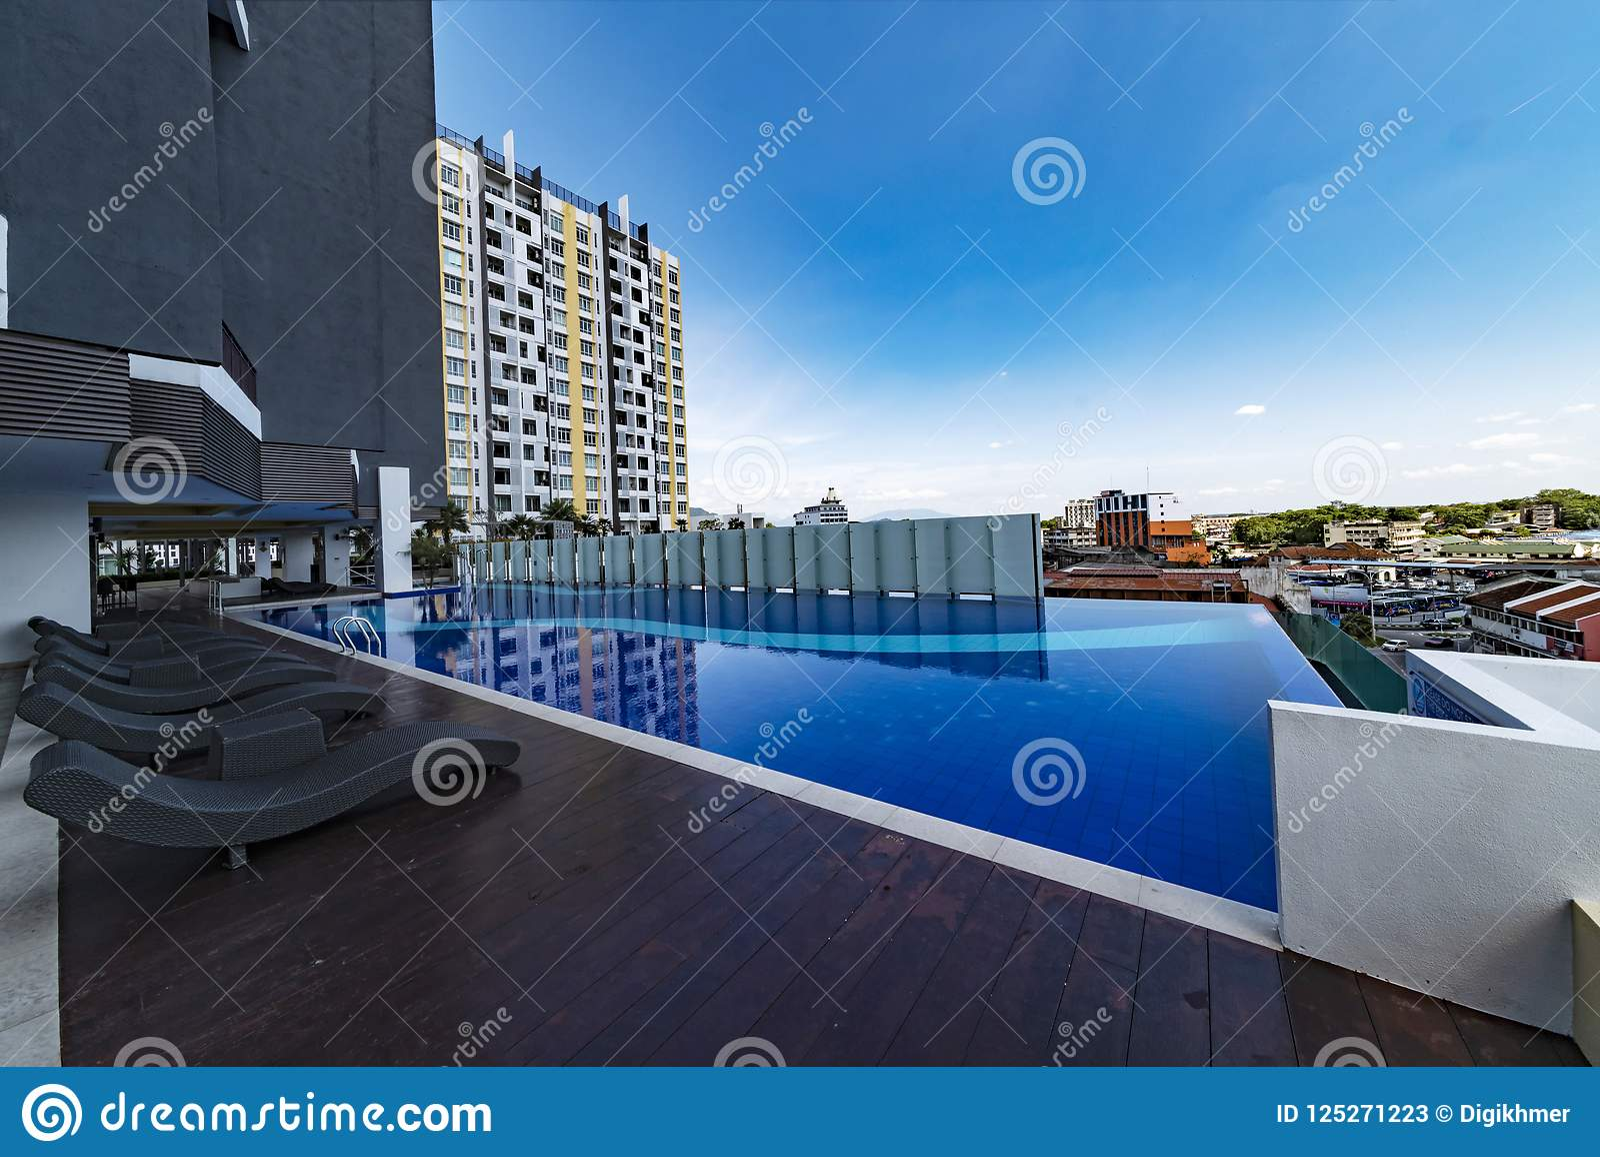 Terrasse And Swimming Pool Of Malaysian Condominium Stock Image